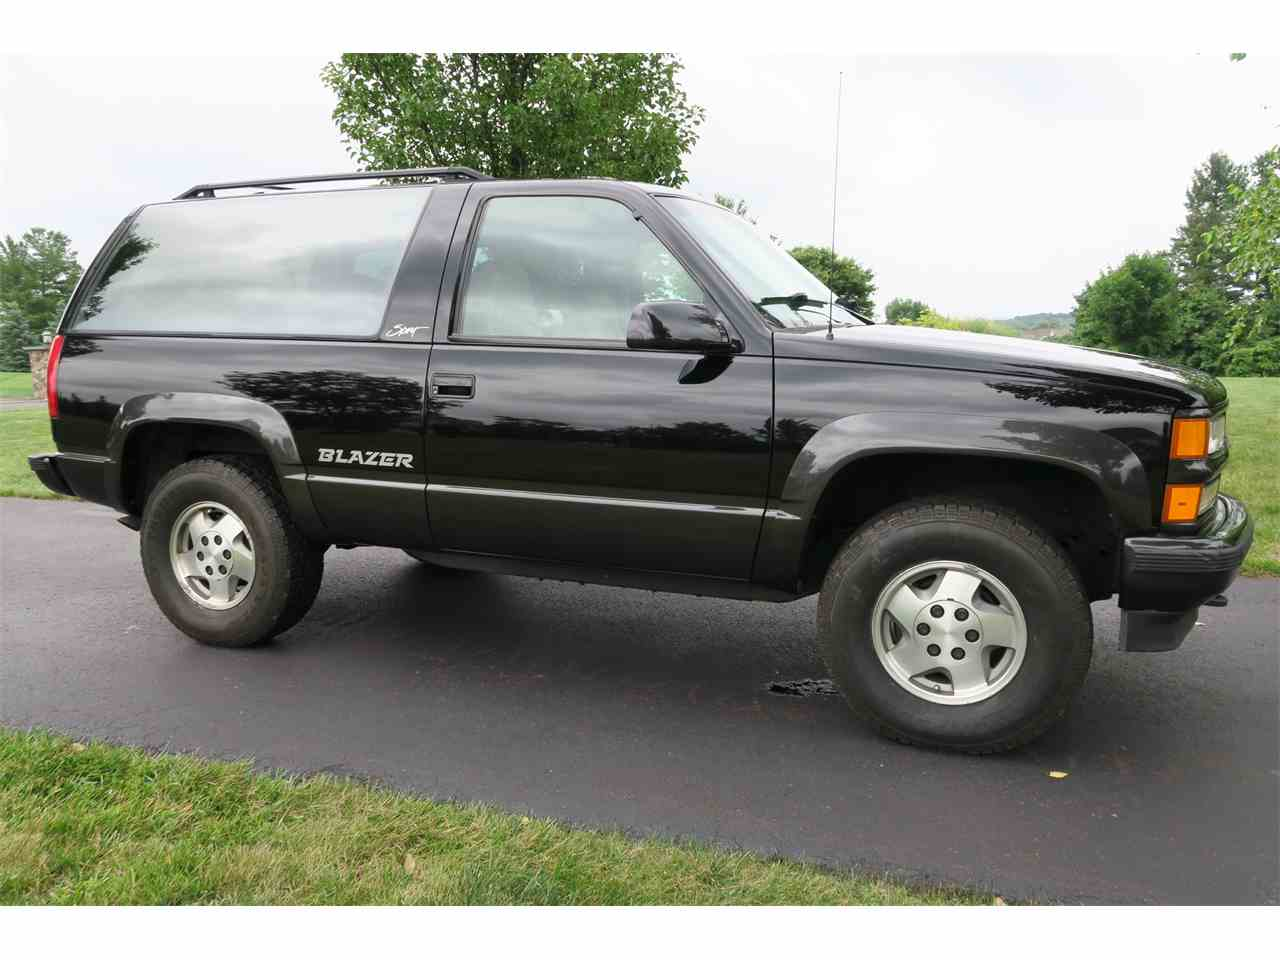 Blazer » 1994 Chevrolet Blazer Parts - Old Chevy Photos Collection ...